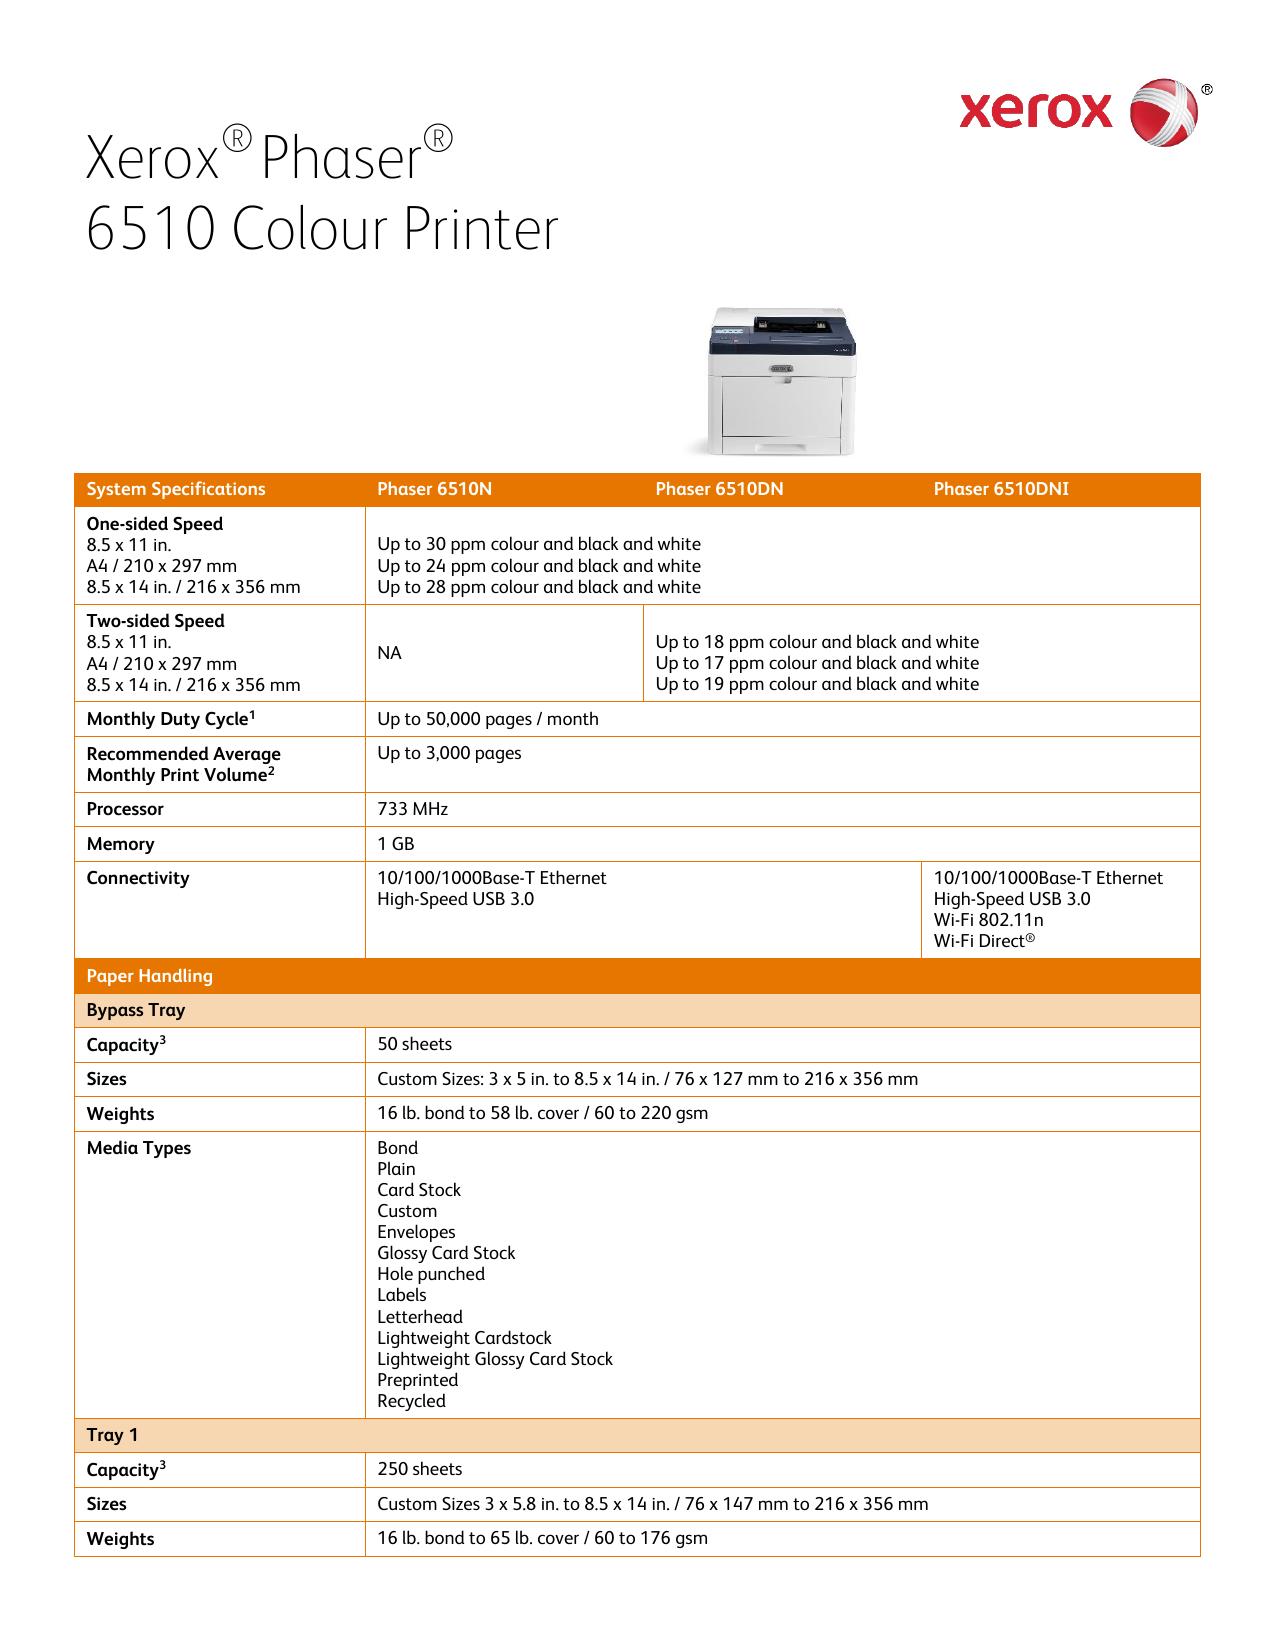 Xerox® Phaser® 6510 Colour Printer | manualzz com